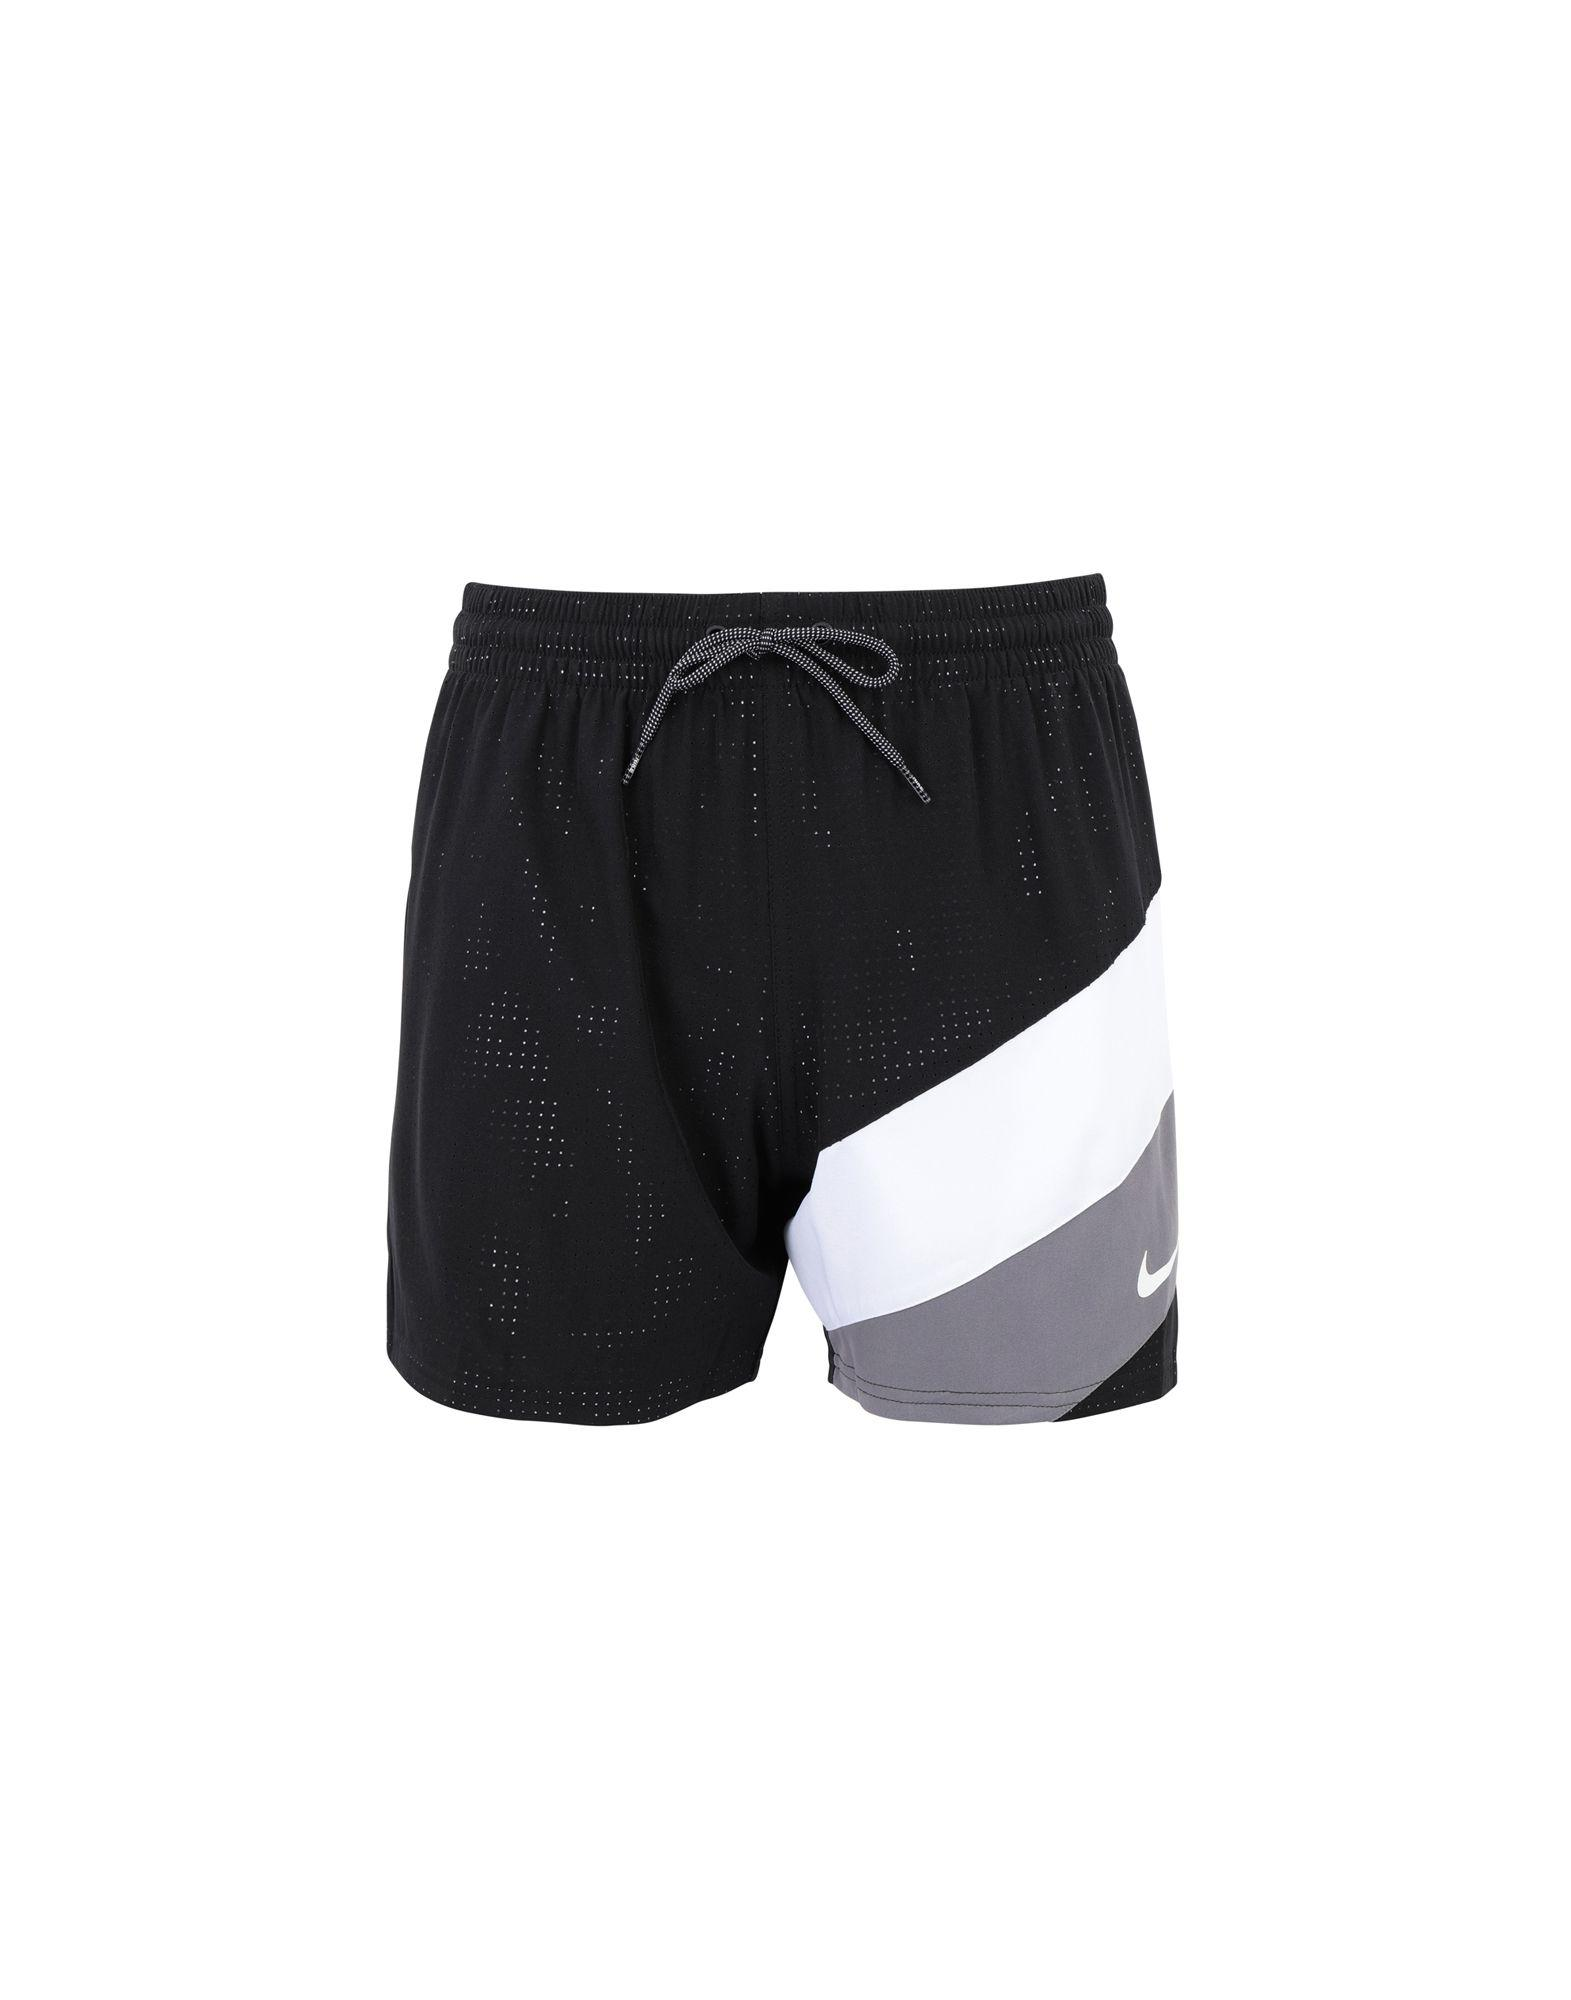 7e8cb7d0 Nike - Black Beach Shorts And Pants for Men - Lyst. View fullscreen